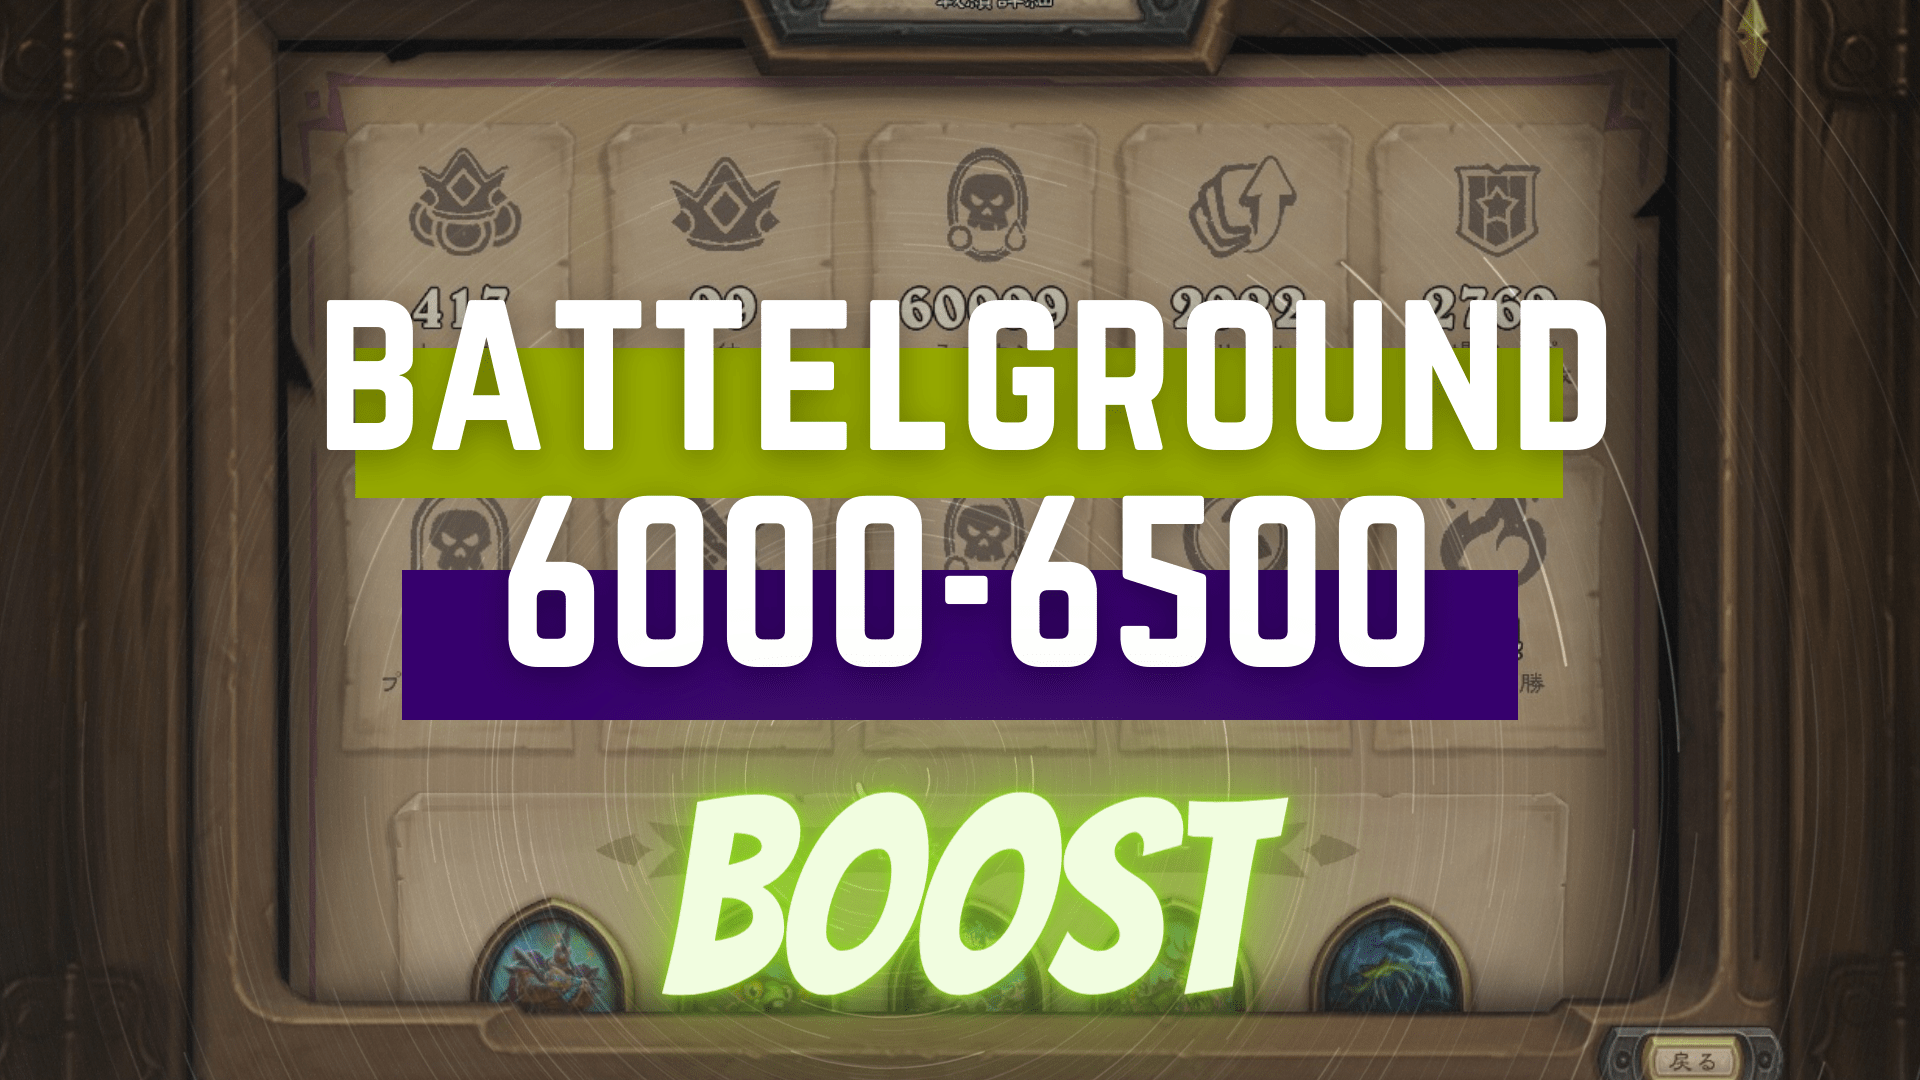 [BATTLEGROUNDS RATING] BOOST FROM 6000 TO 6500 Zafari - e2p.com